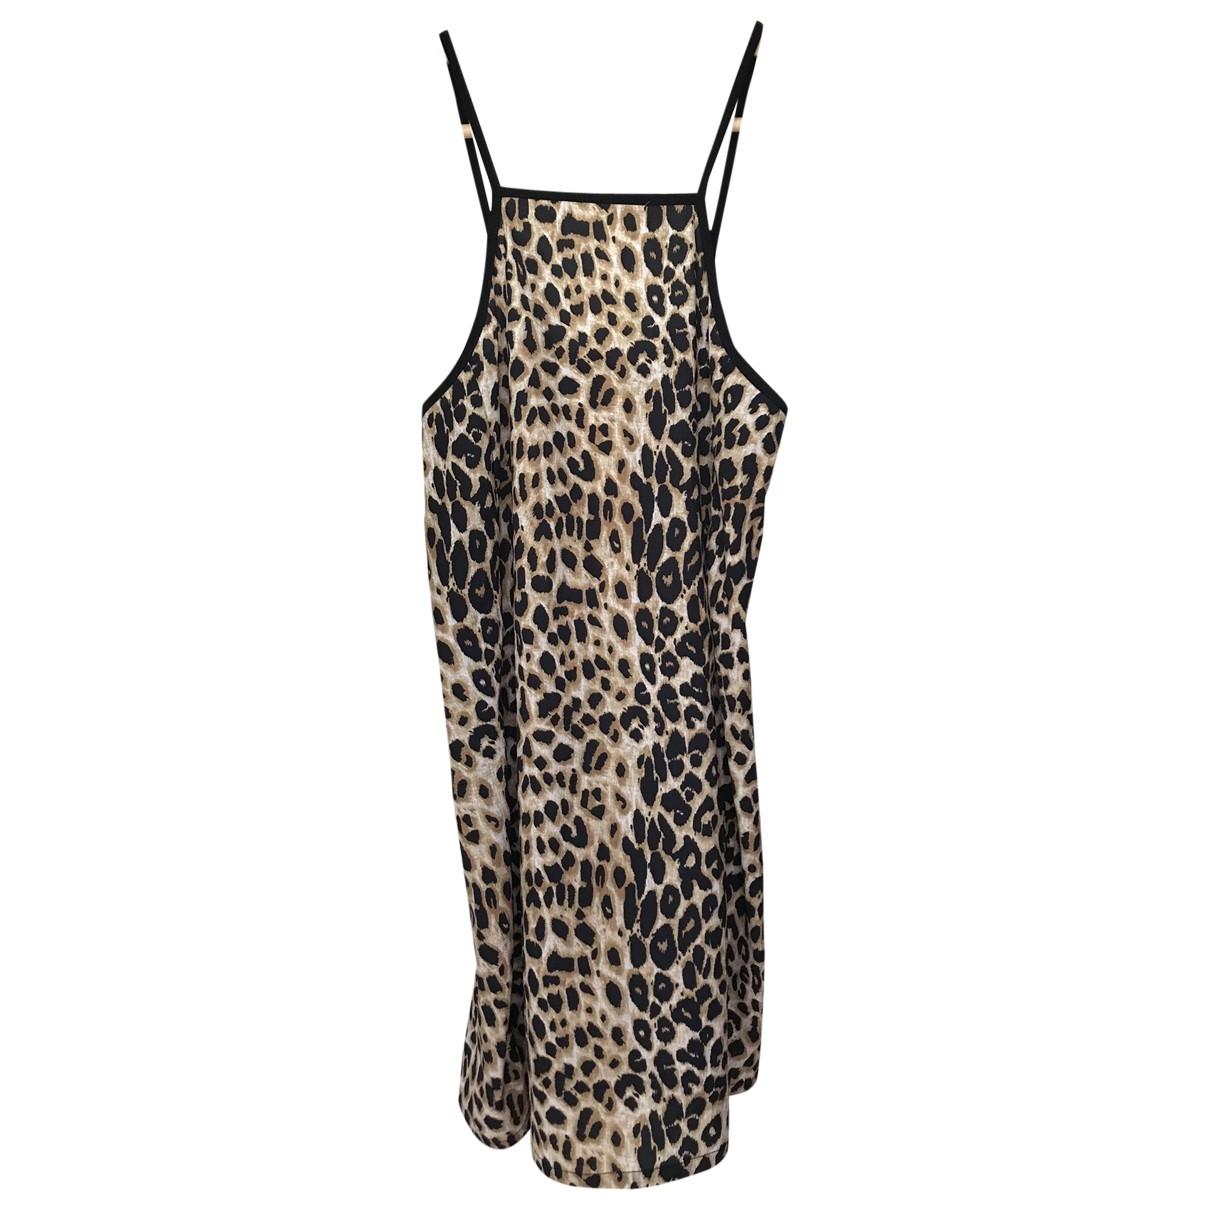 Minkpink \N Black dress for Women XS International